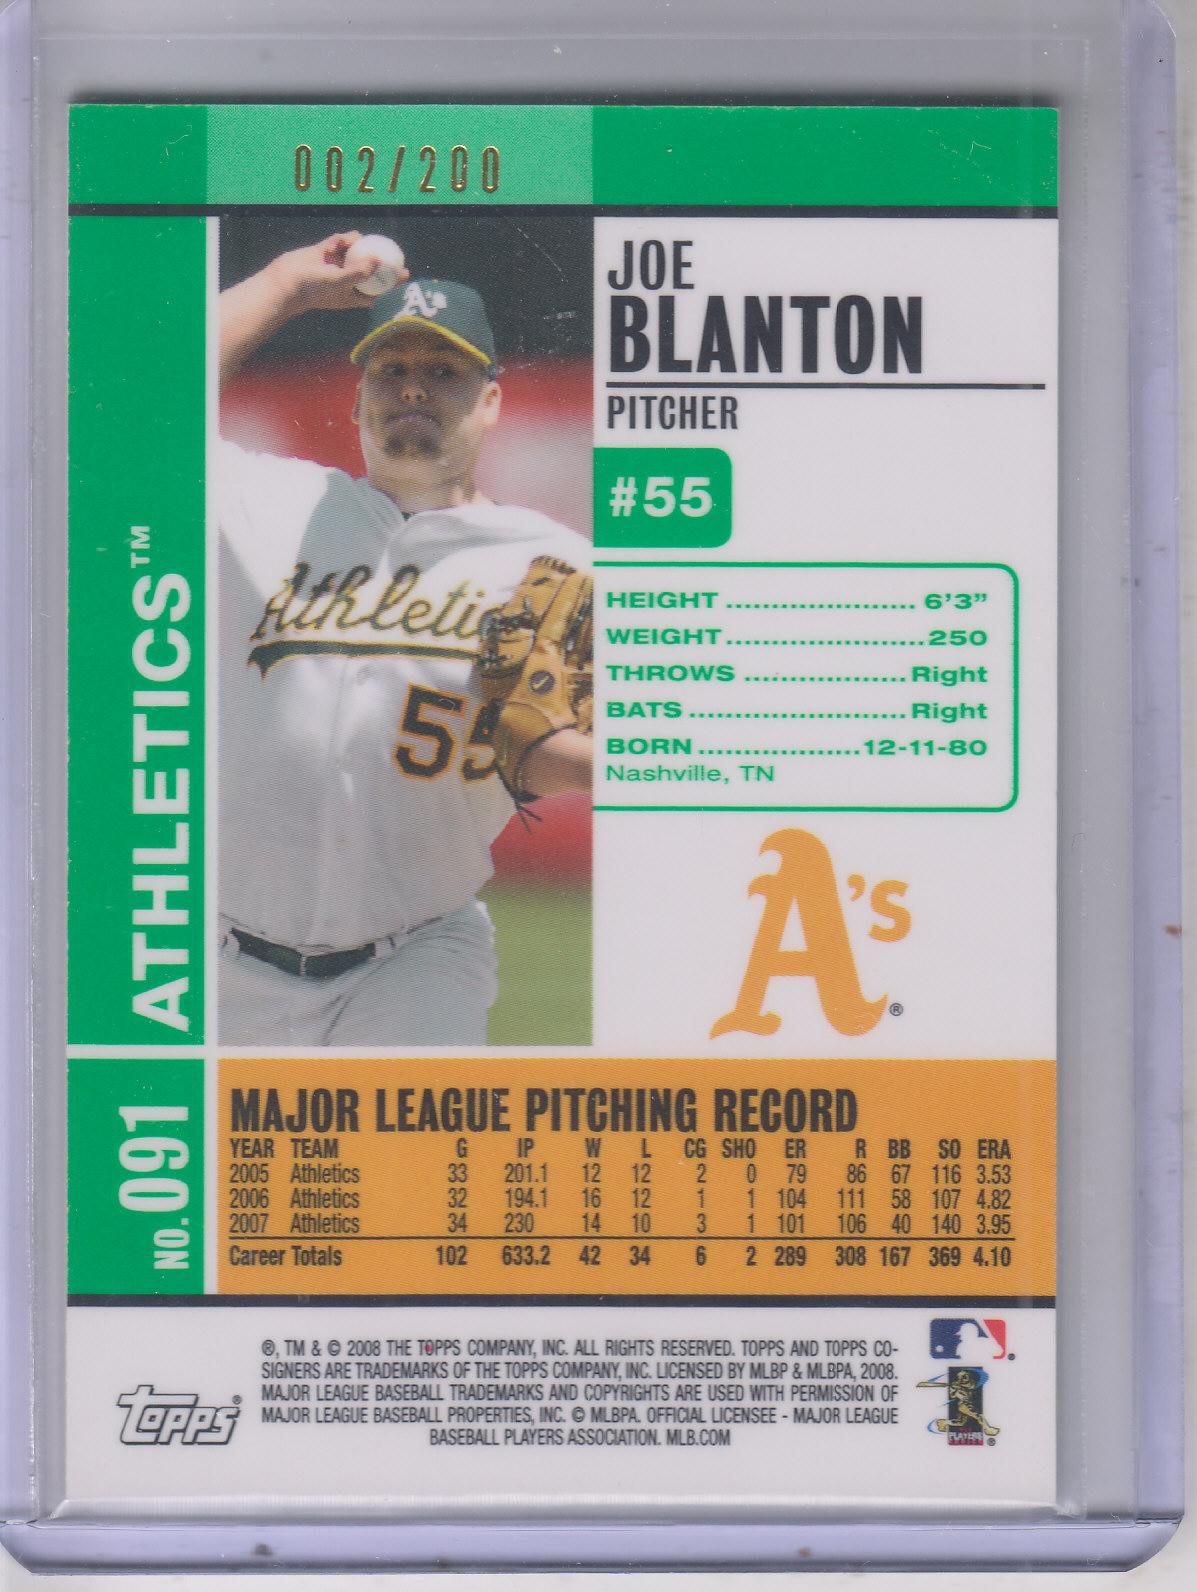 2008 Topps Co-Signers Silver Green #91a Joe Blanton back image